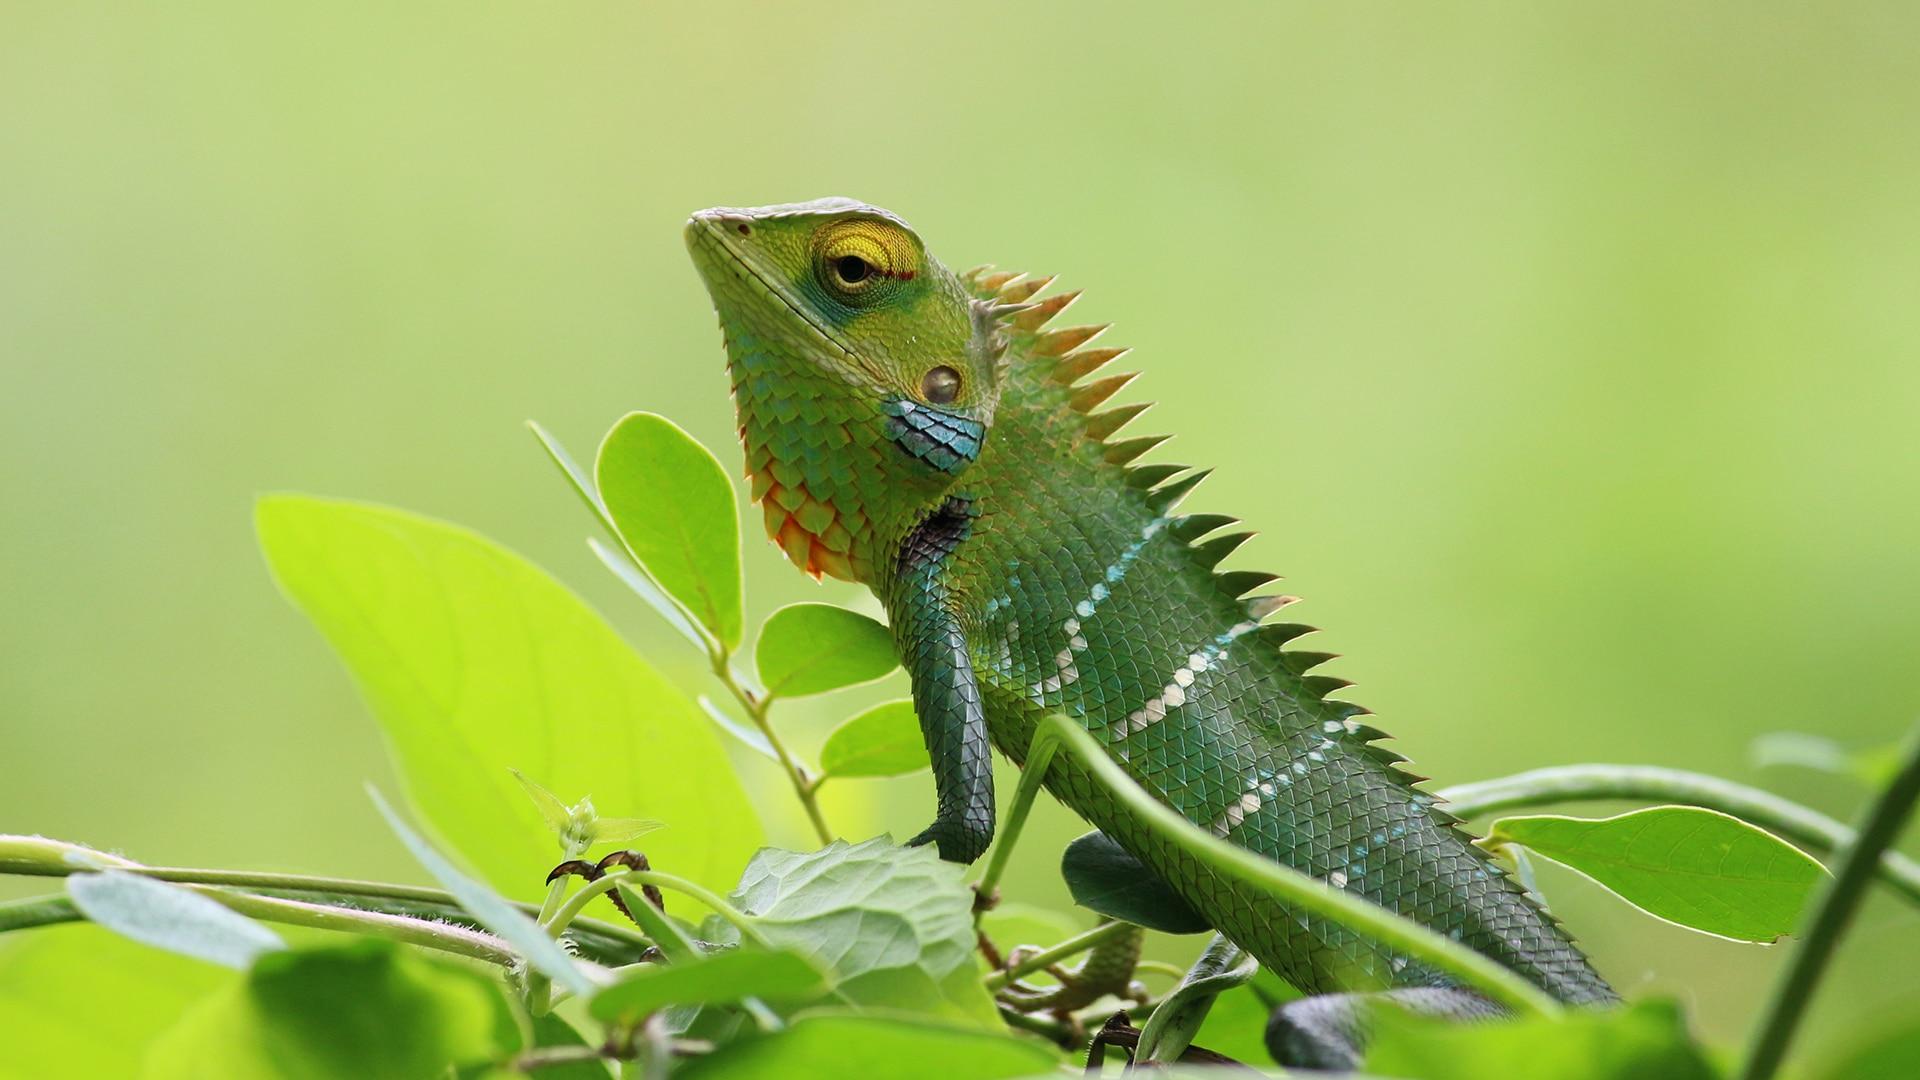 Lizard perches on greenery